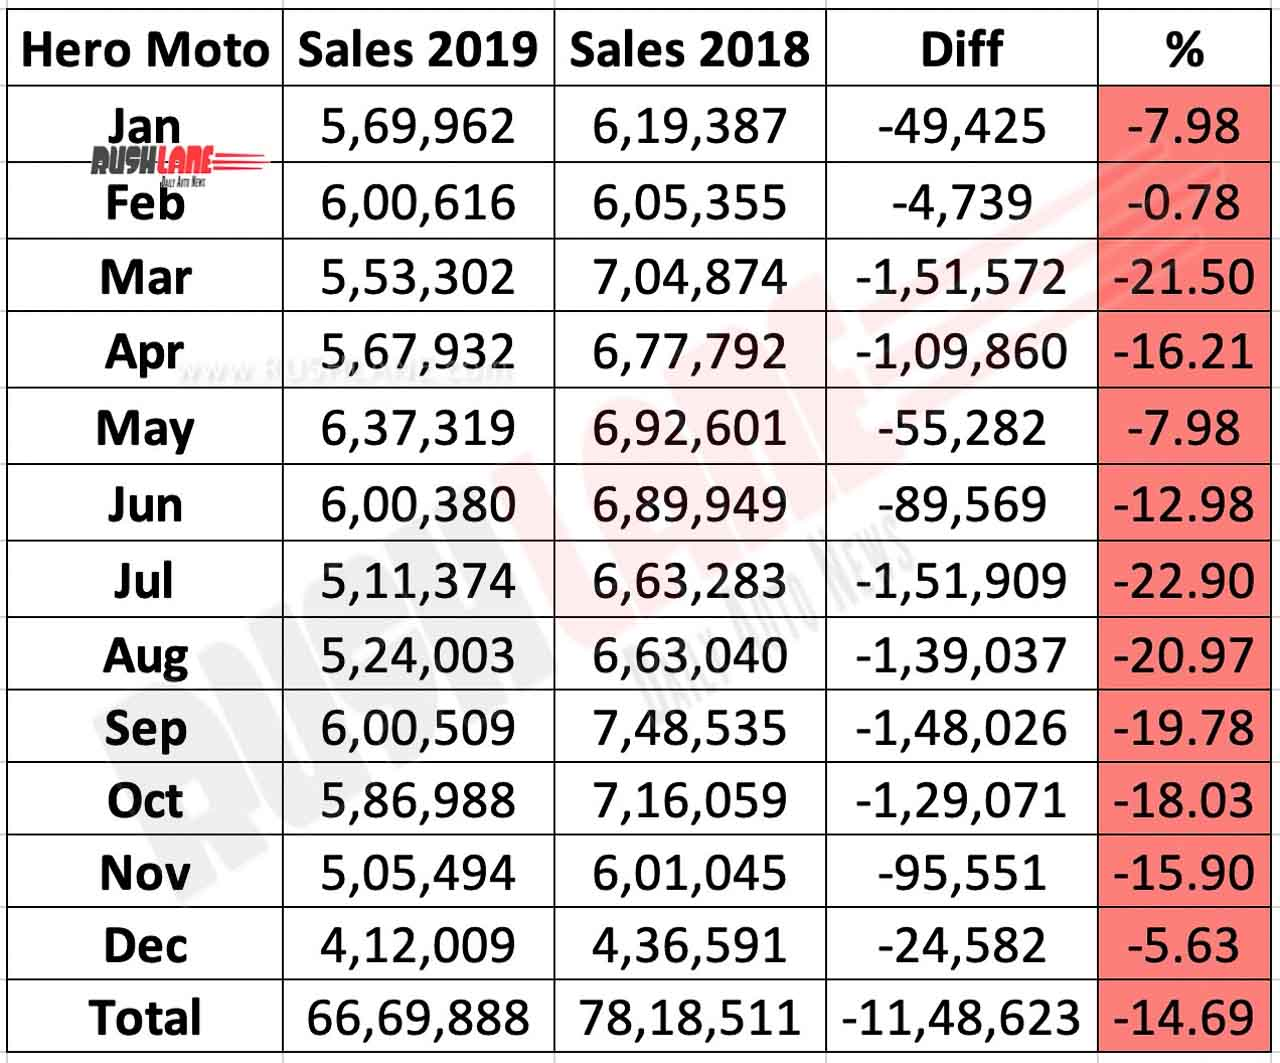 Hero MotoCorp sales 2019